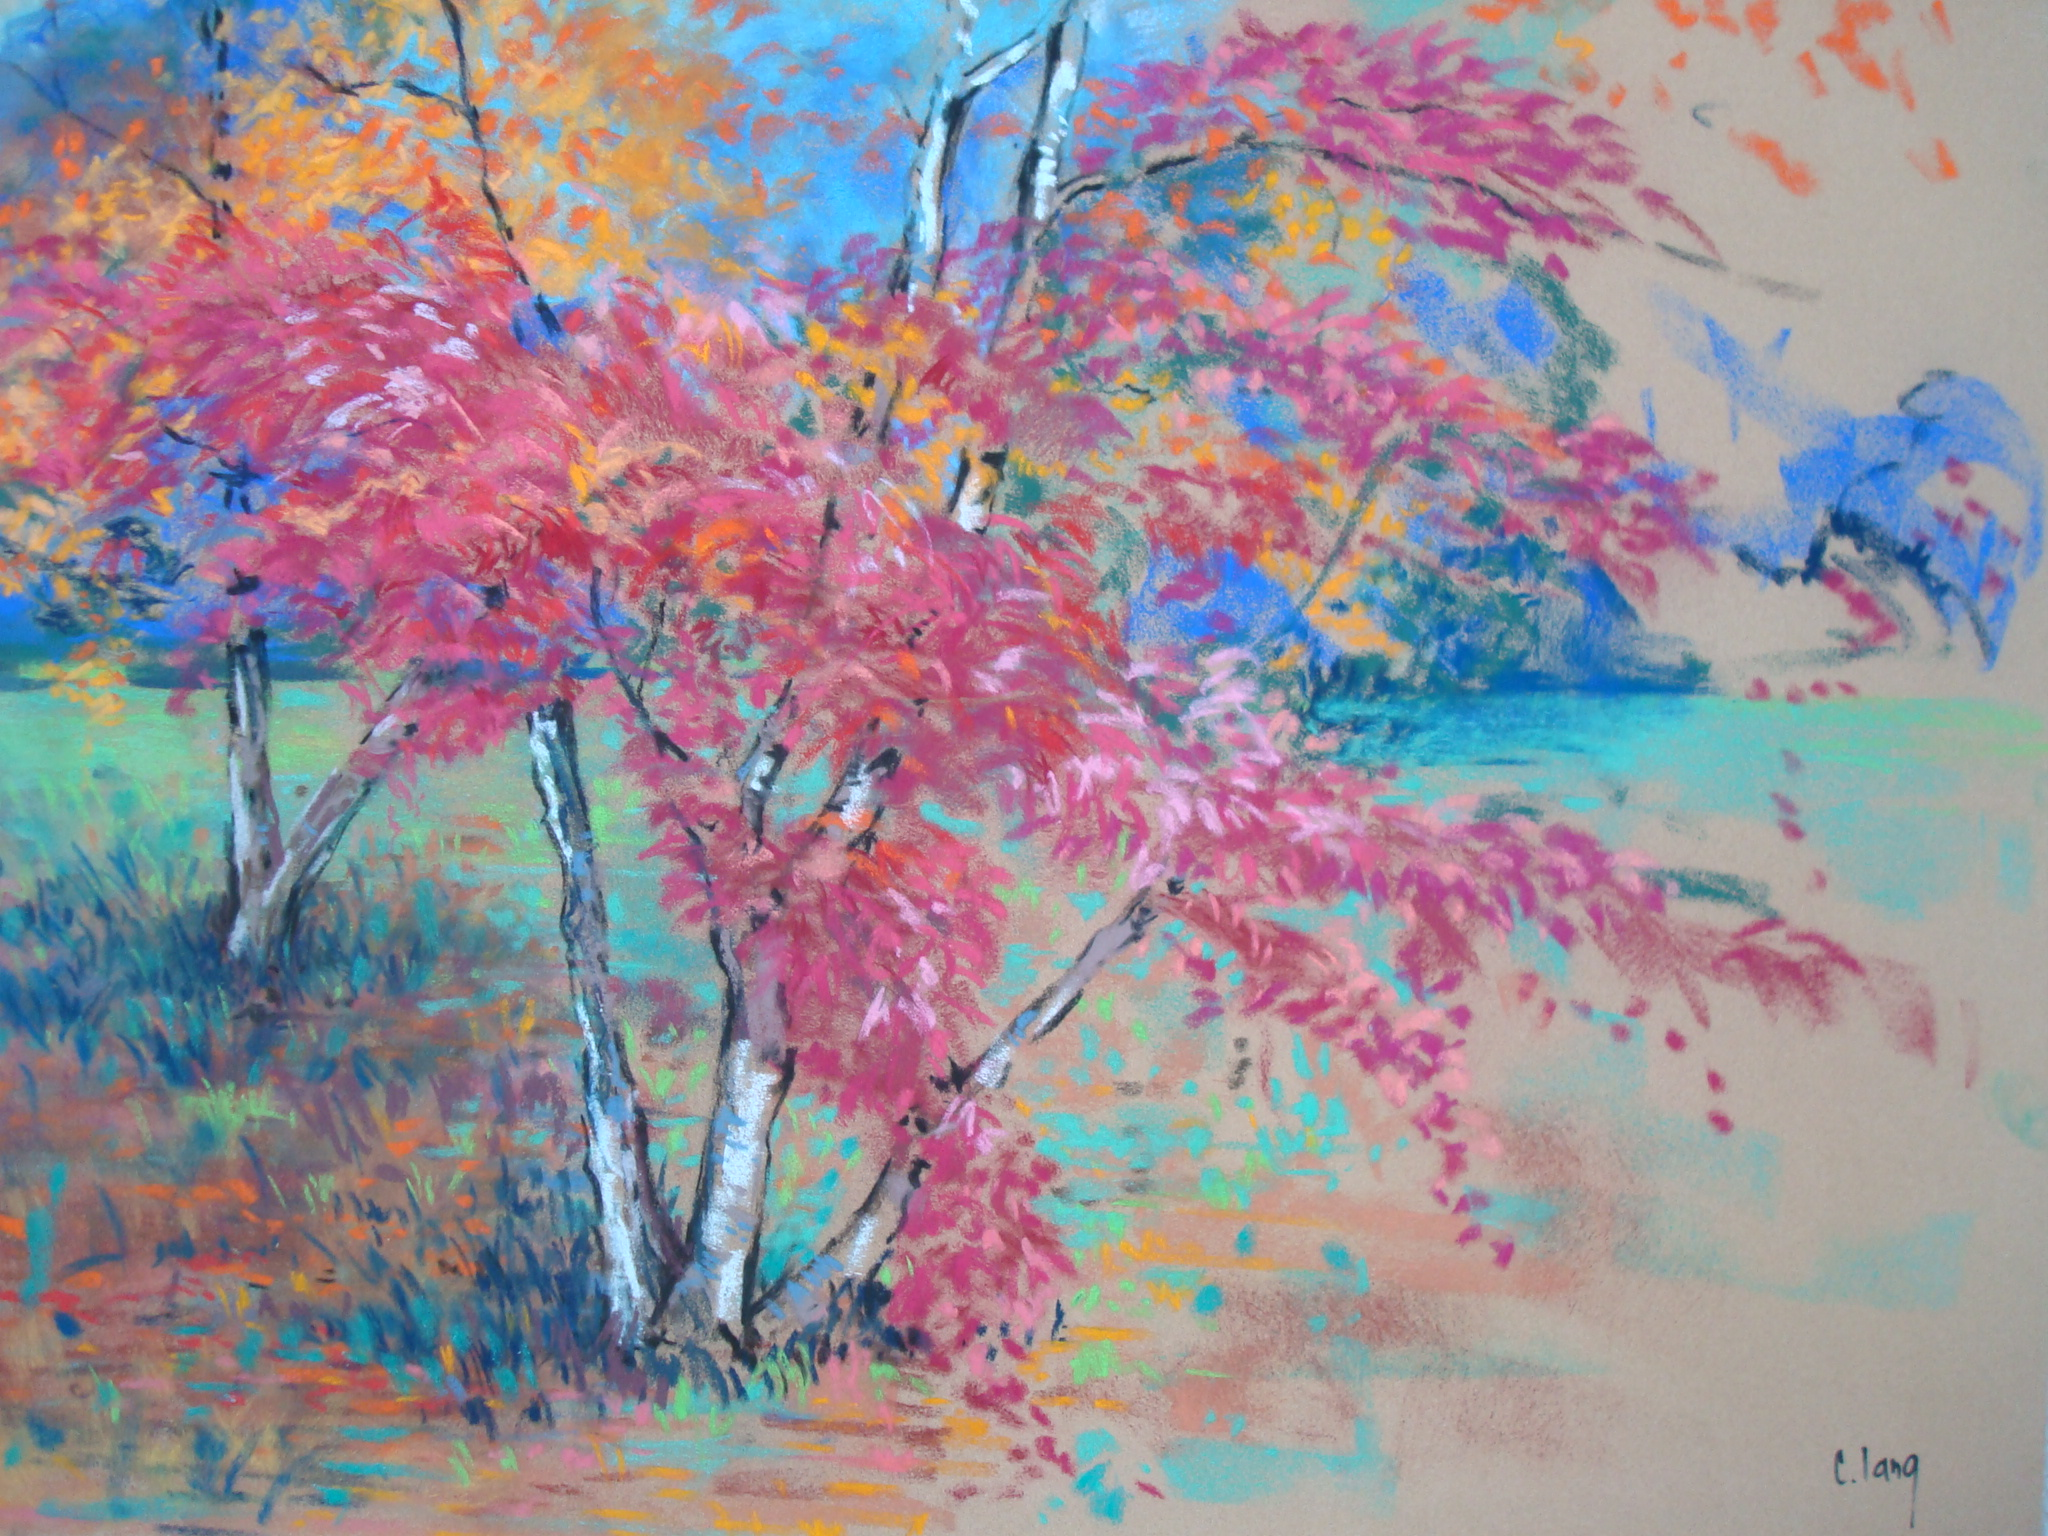 Très pastel sec | Clang artiste peintre BO03